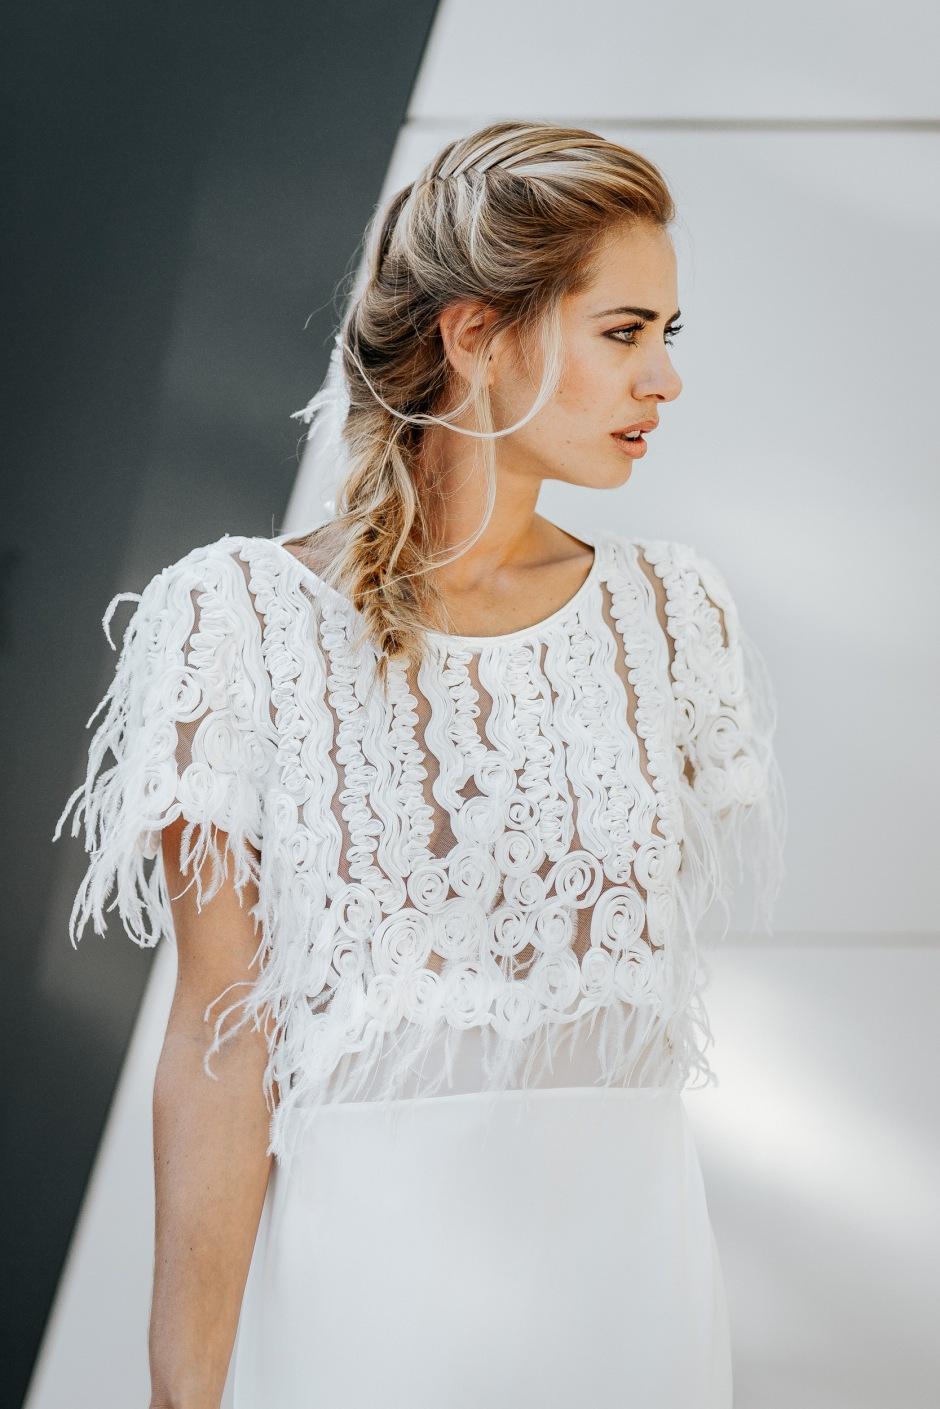 elisa-ness-la-blogueuse-mariage-9